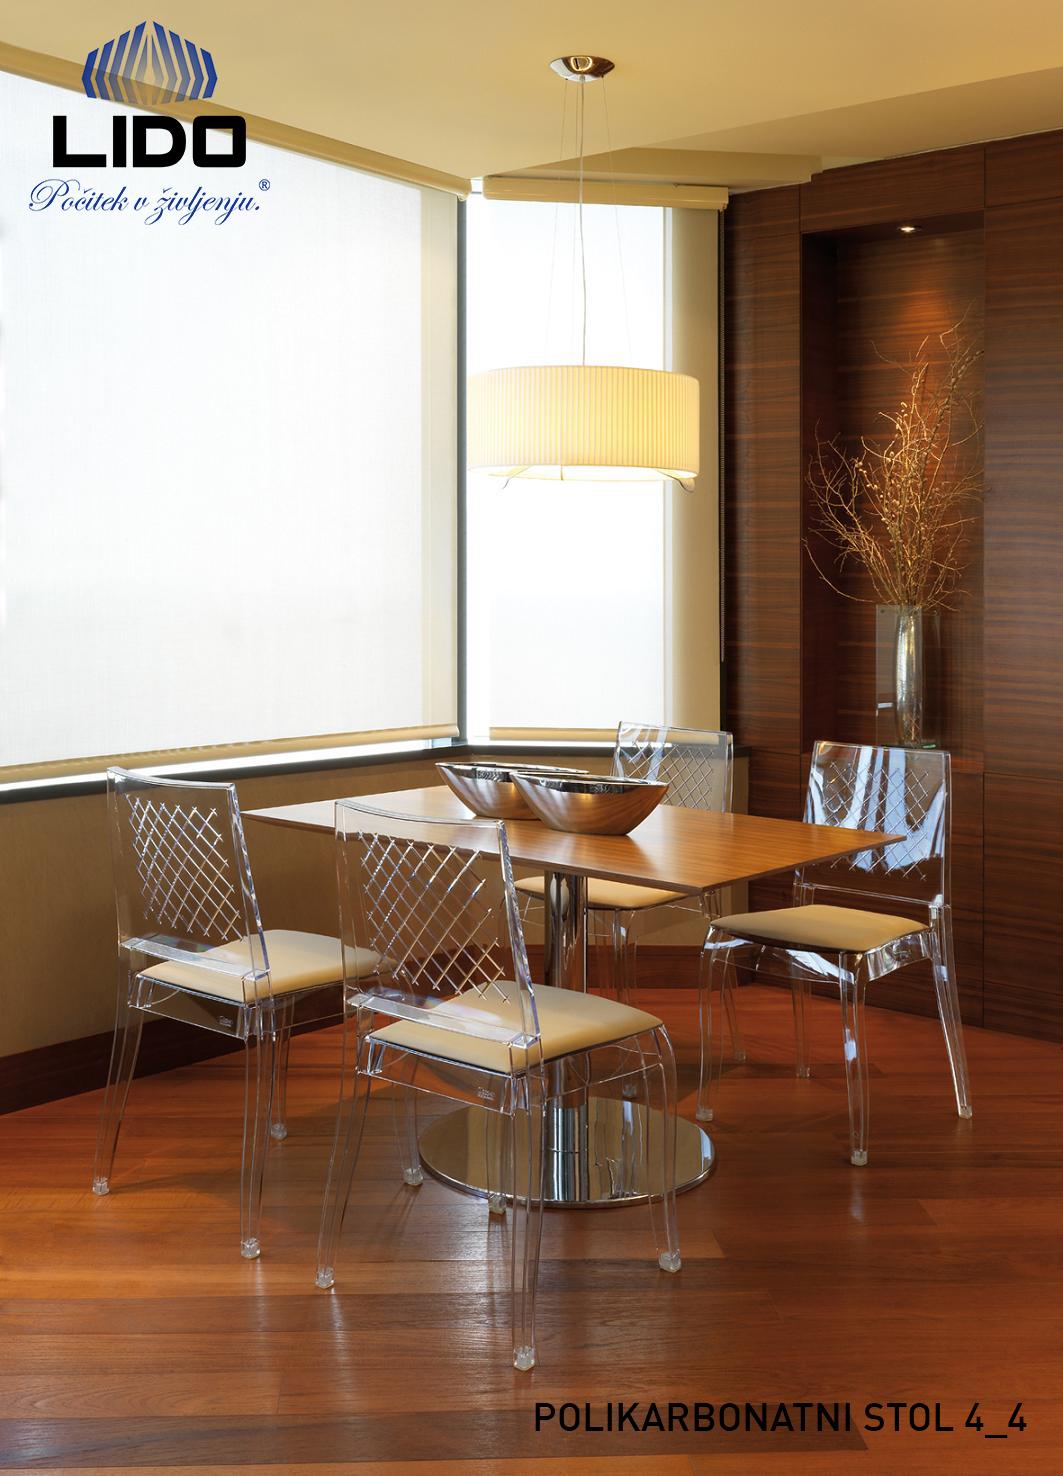 Lido_Polikarbonatni stoli 4_4